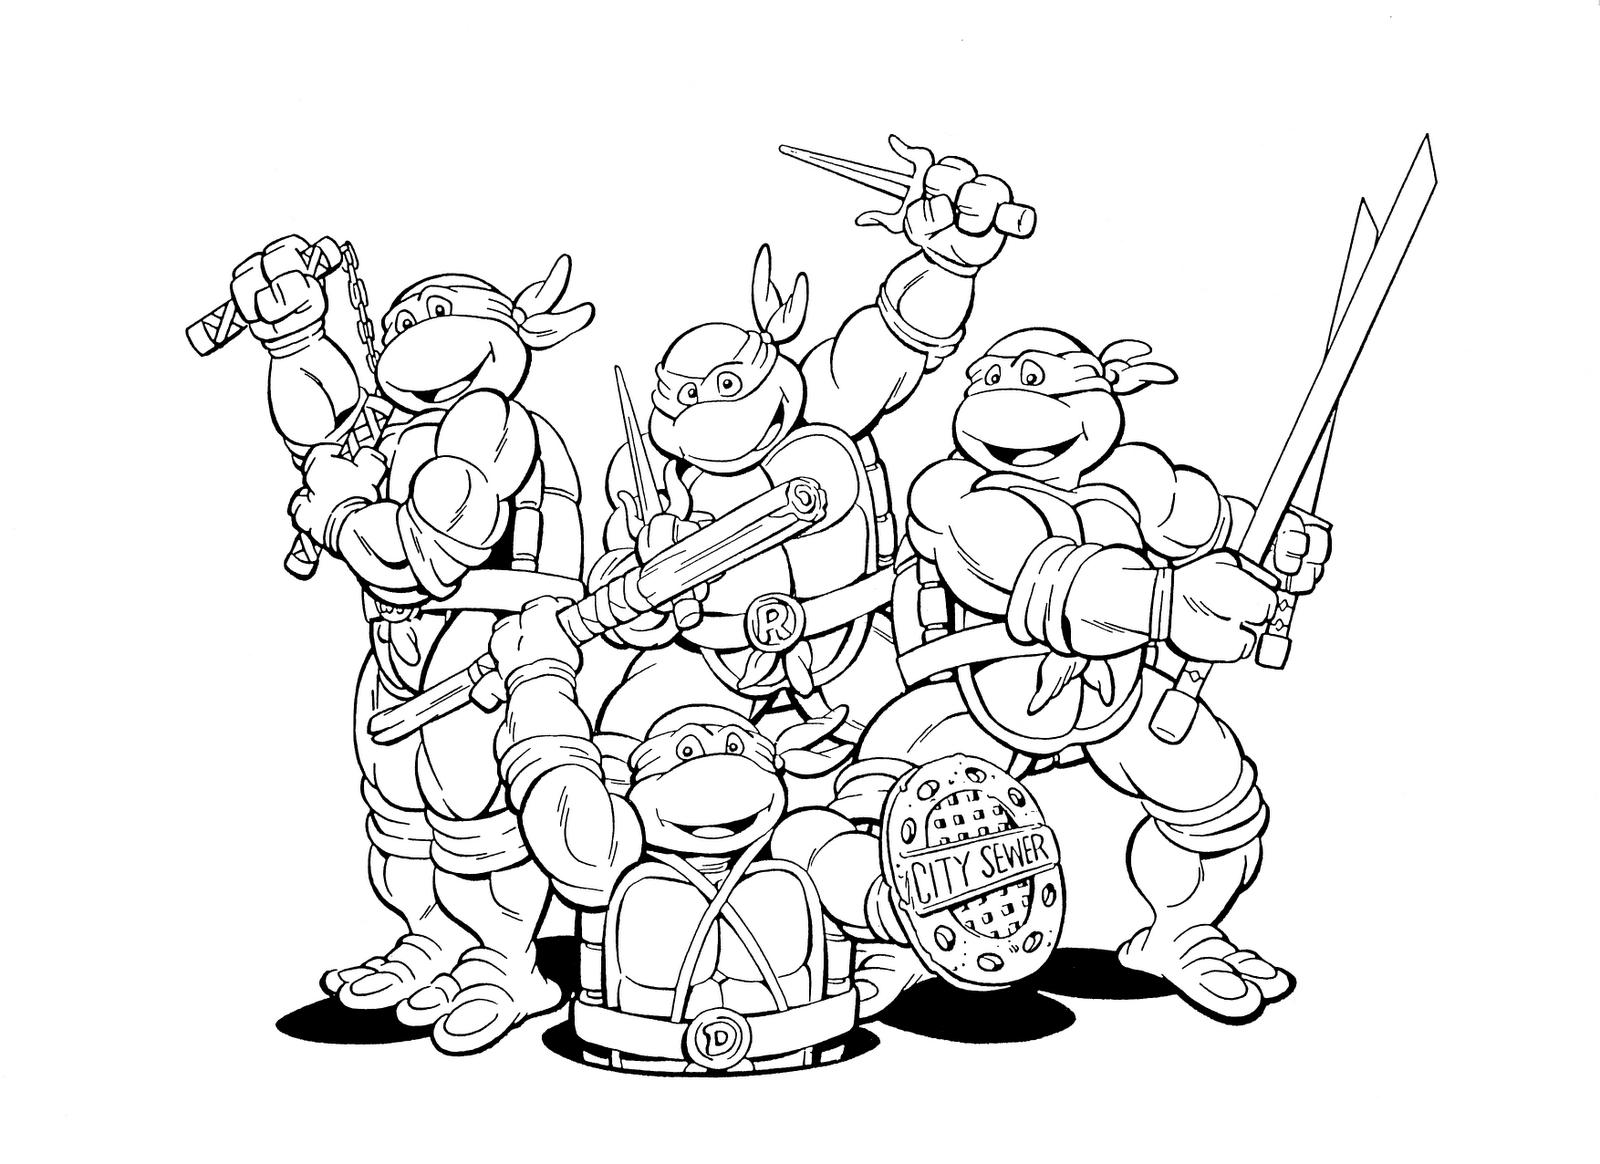 teenage mutant ninja turtles coloring pages fun coloring pages teenage mutant ninja turtles coloring ninja turtles teenage coloring mutant pages